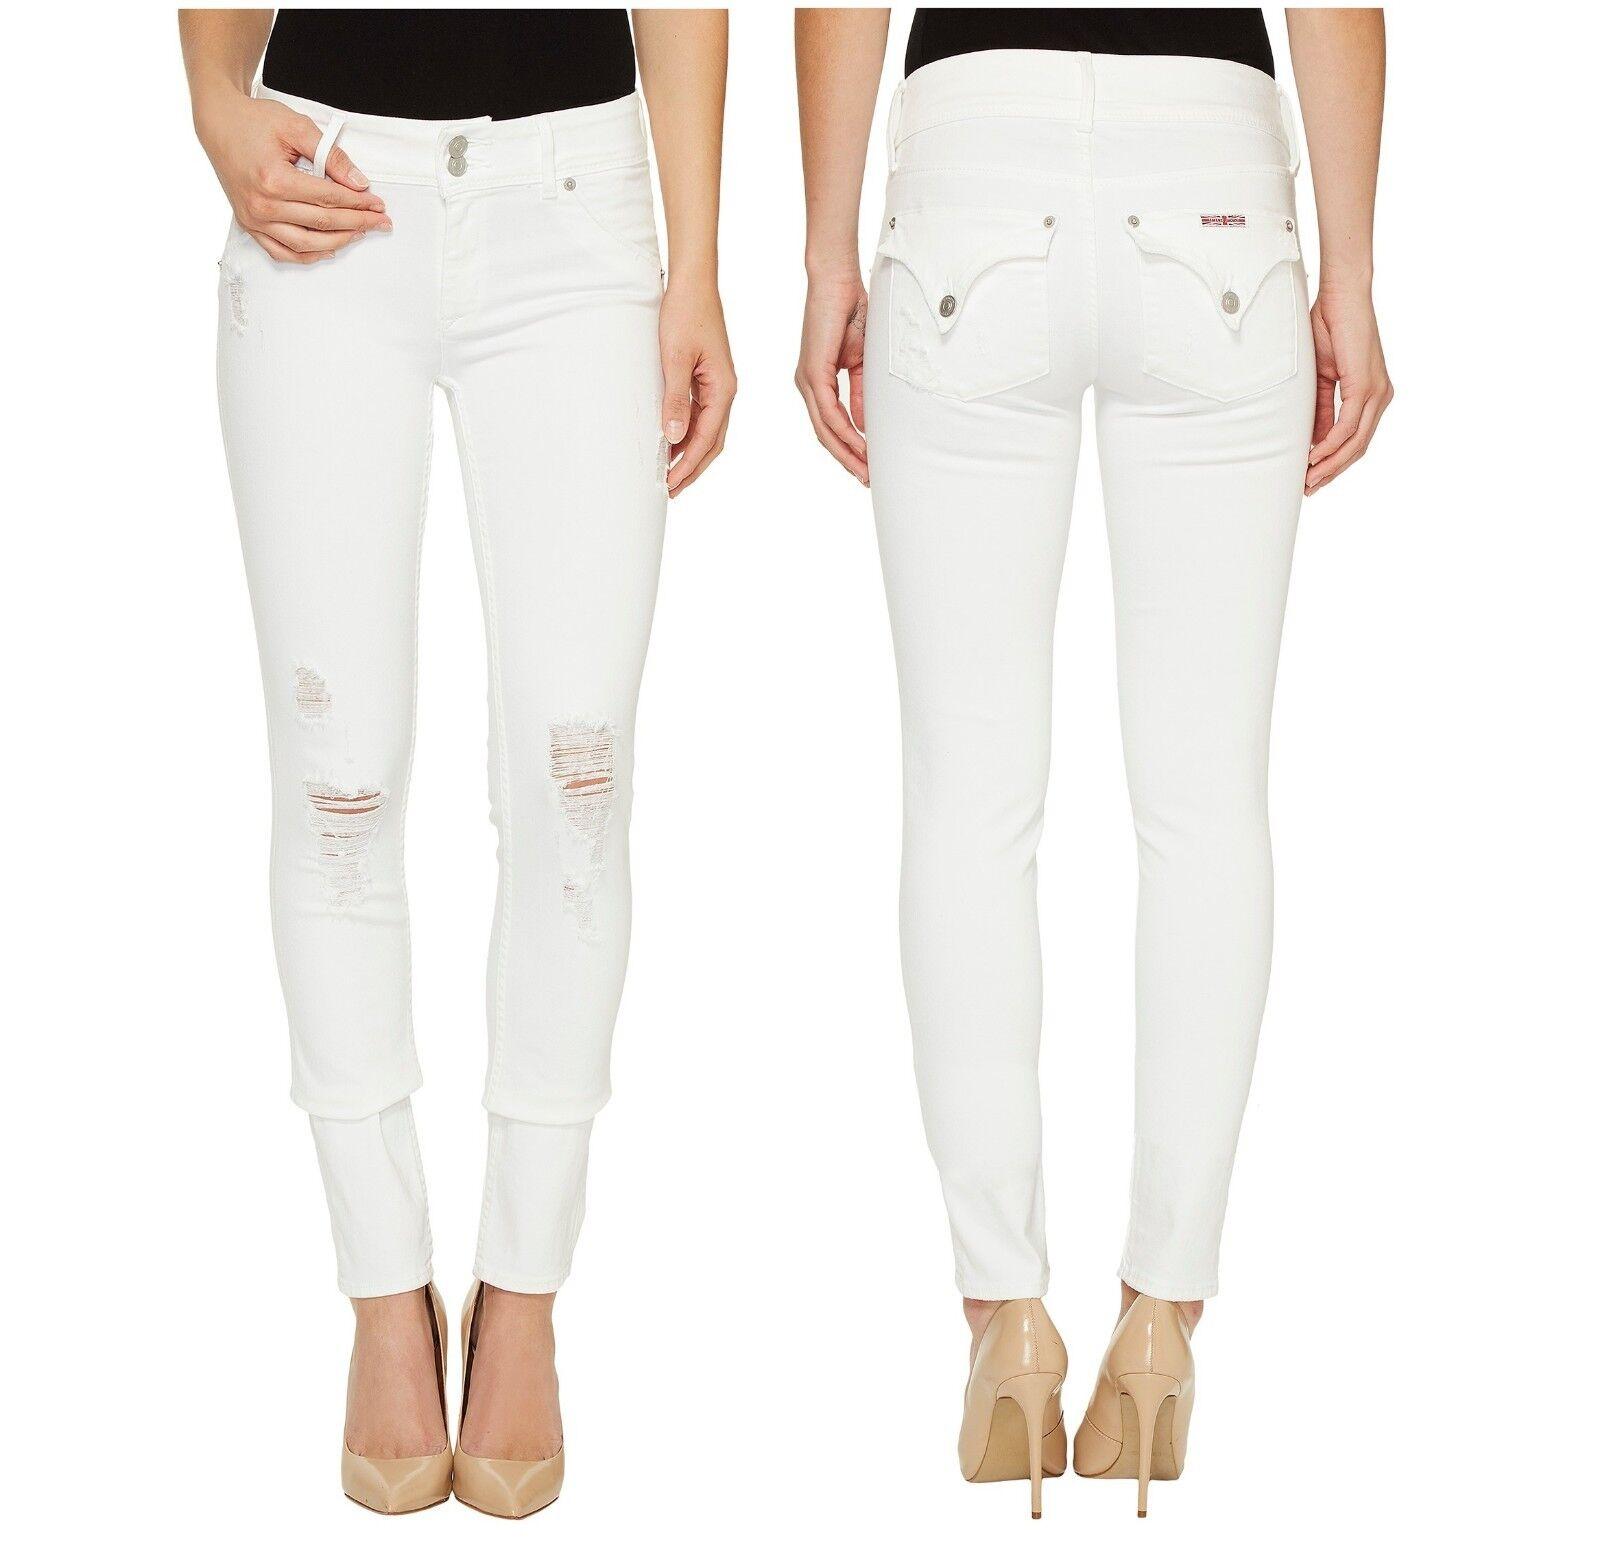 HUDSON damen Collin Slim Skinny Vintage Demolish Rips Weiß Pants Denim Jeans